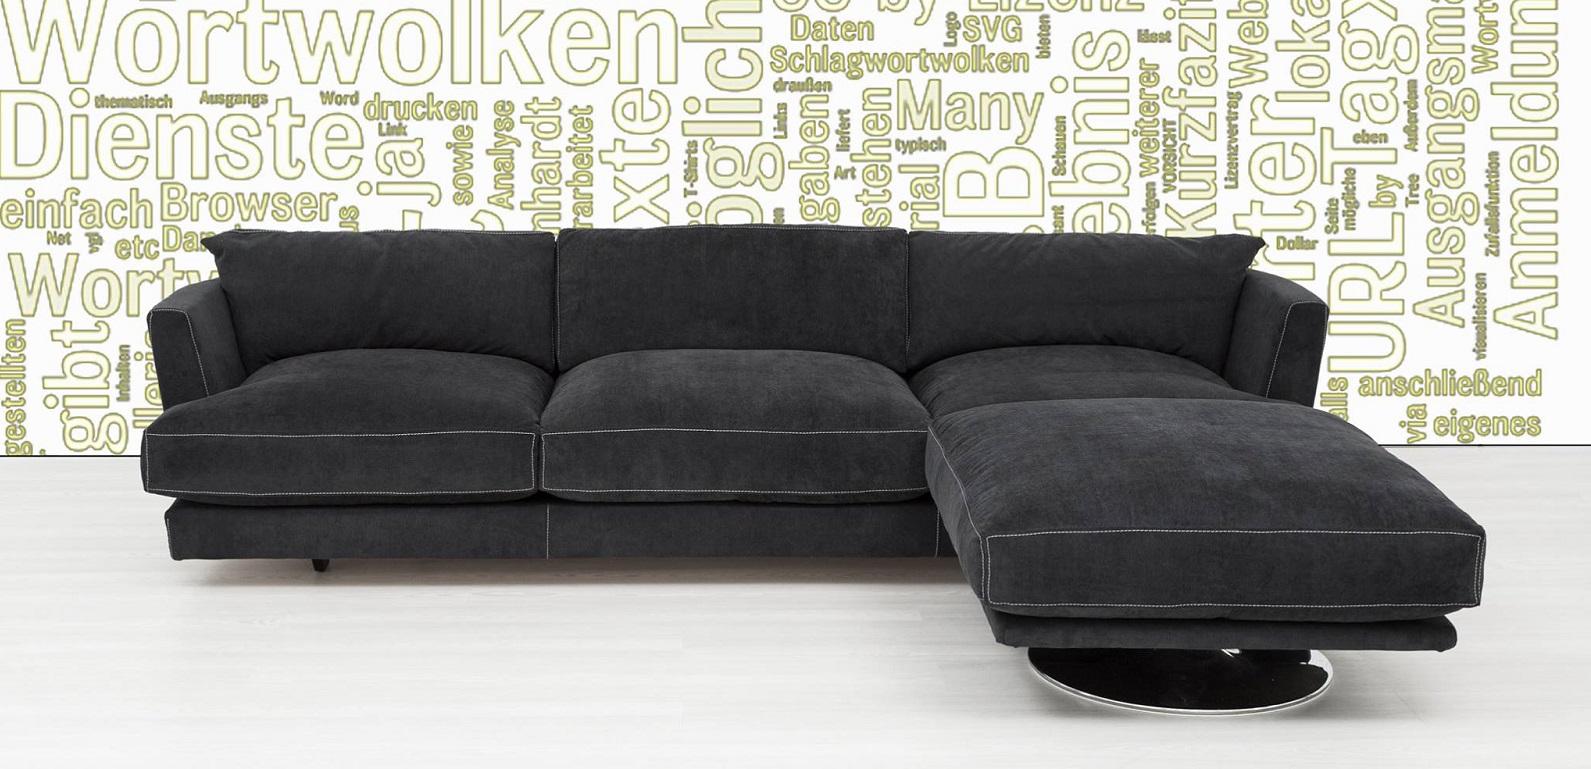 canapea daphne mobello. Black Bedroom Furniture Sets. Home Design Ideas